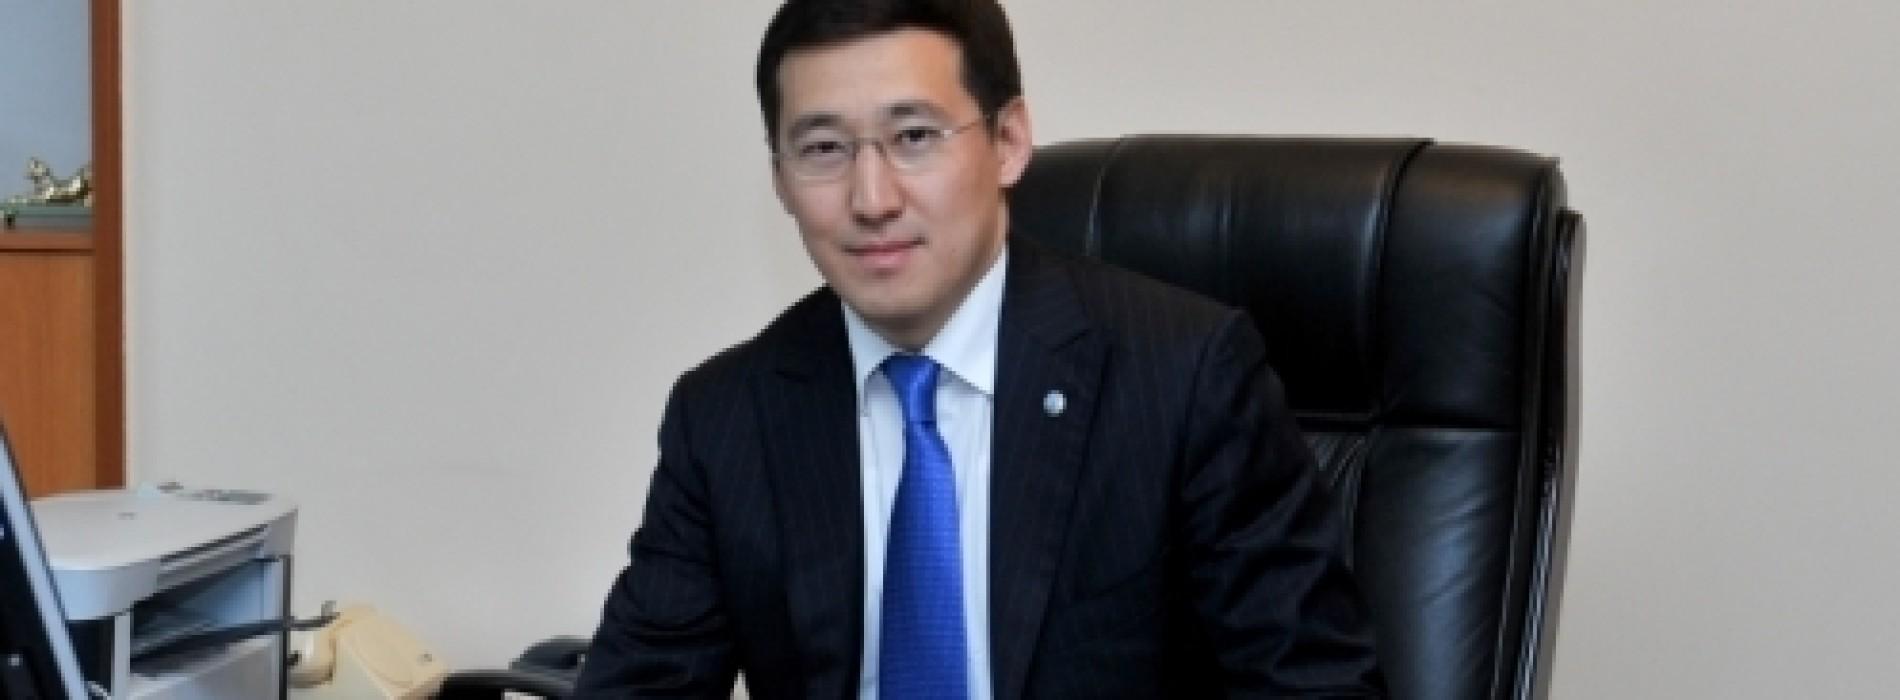 Заместителем акима Алматы назначен Ерлан Аукенов